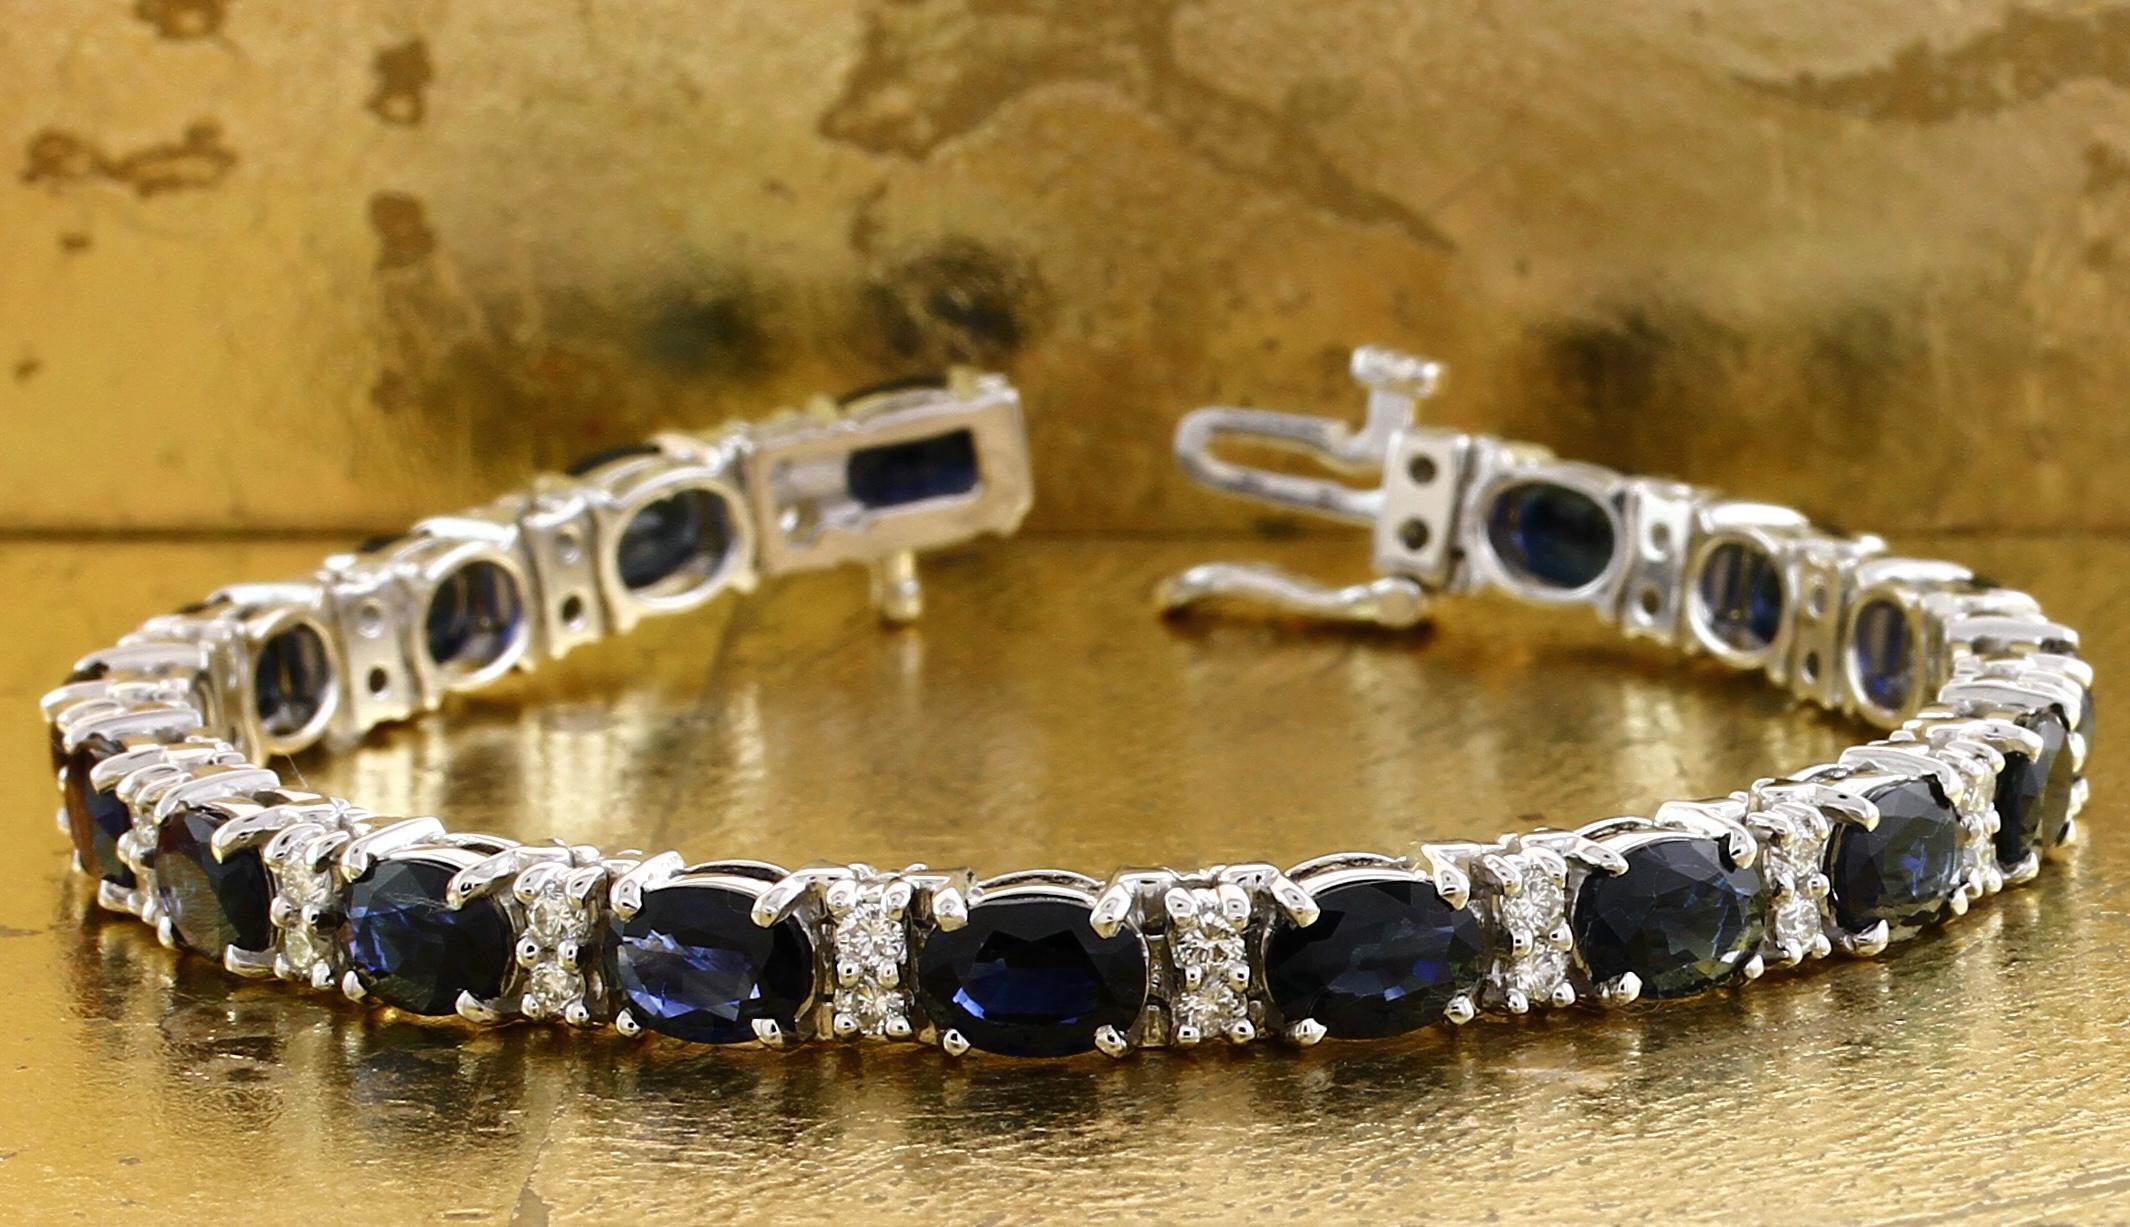 Tennis Bracelet with Oval Sapphires & Round Diamonds - Item No: 0010641